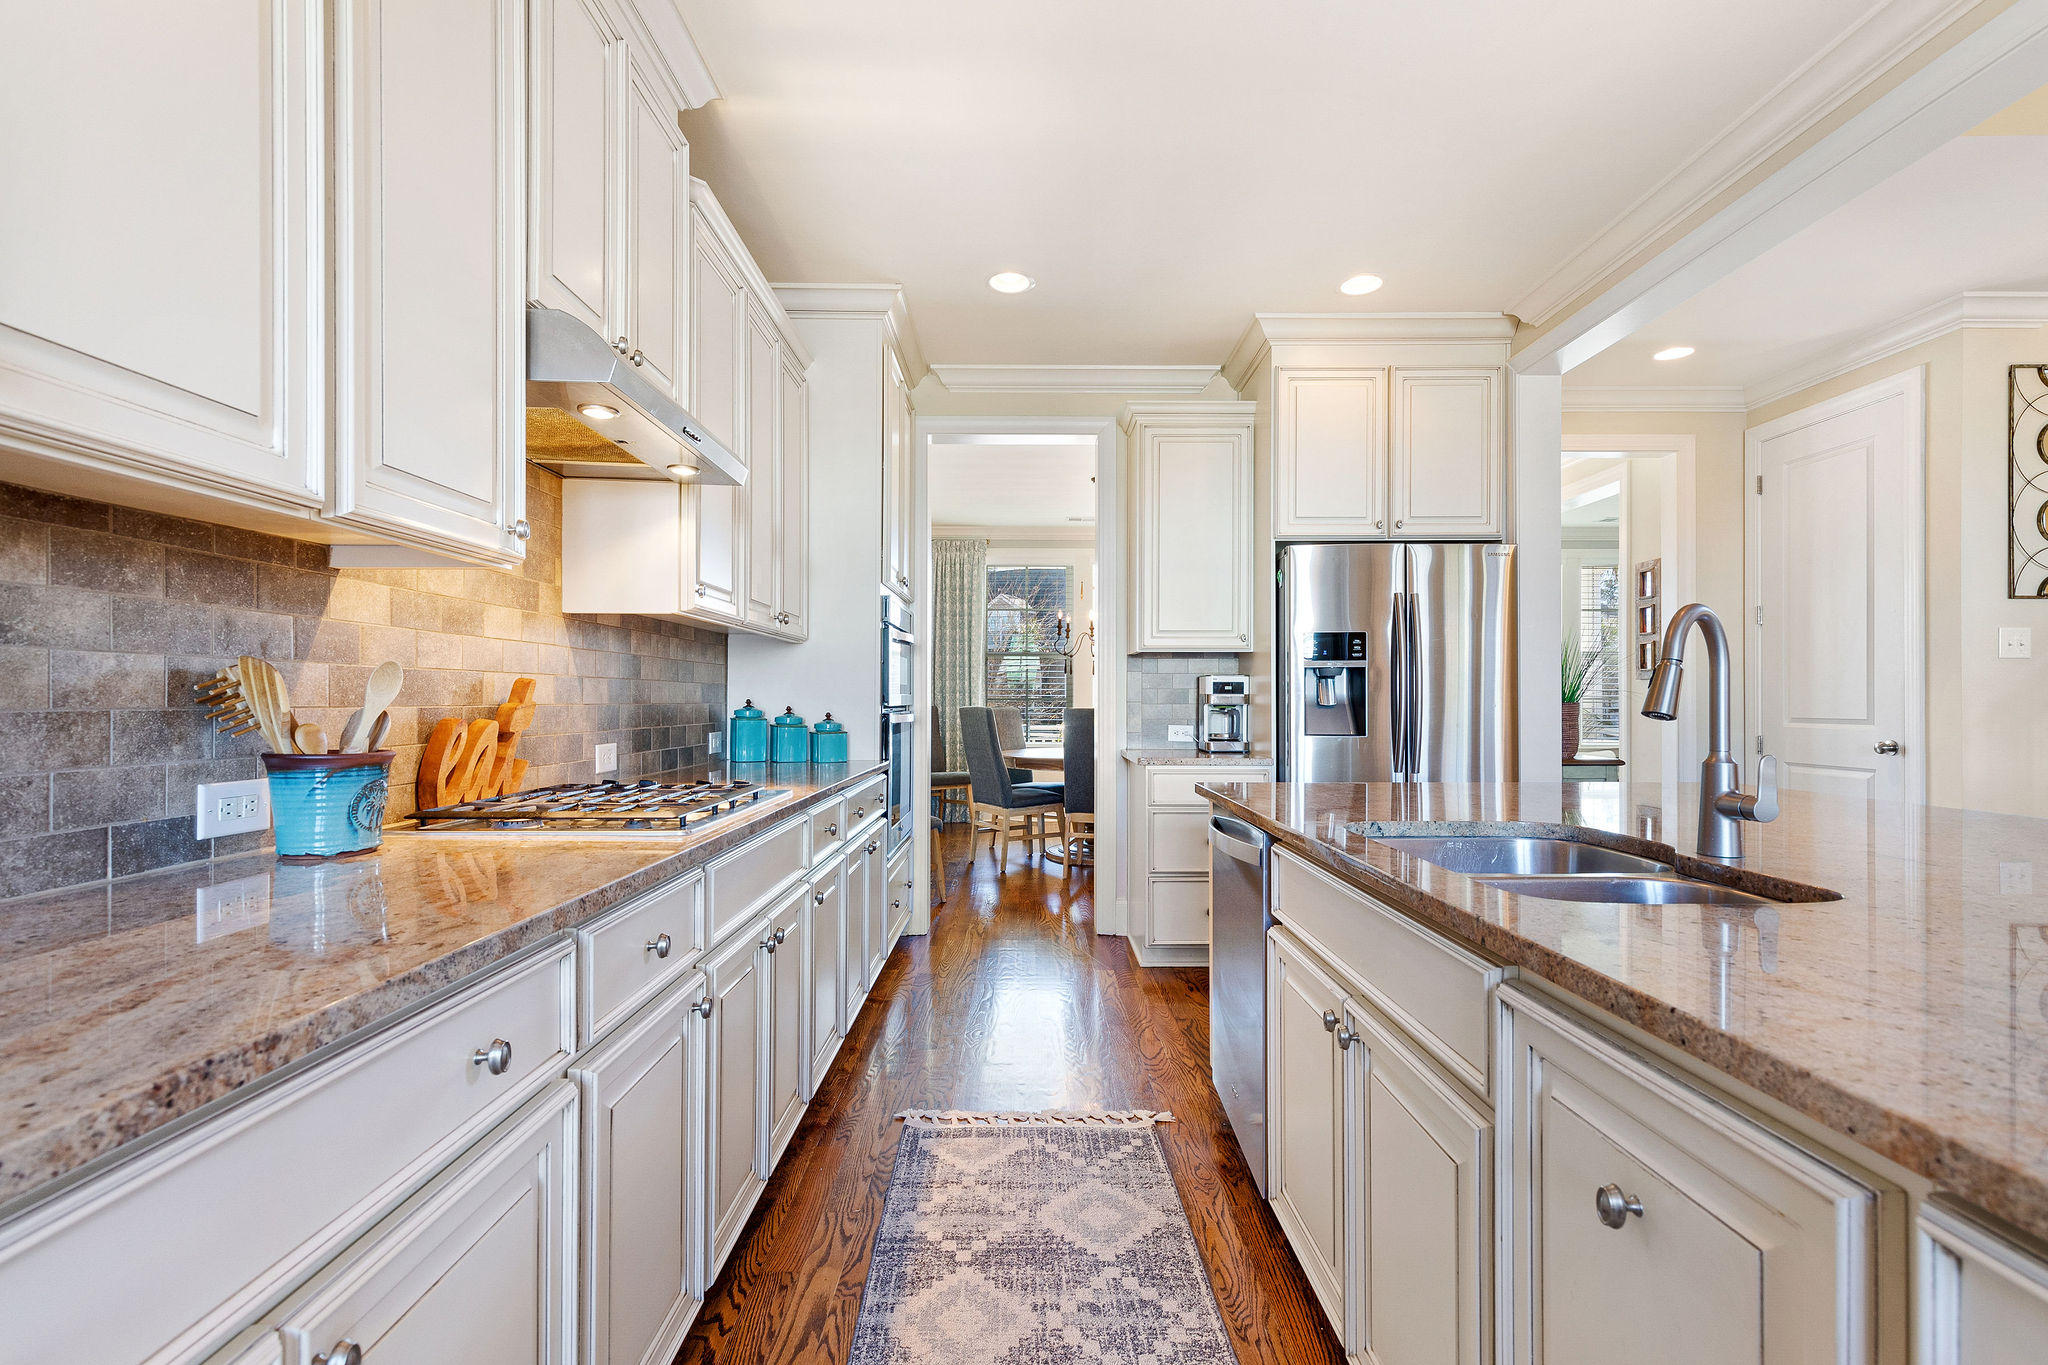 Dunes West Homes For Sale - 3212 Hatchway, Mount Pleasant, SC - 18